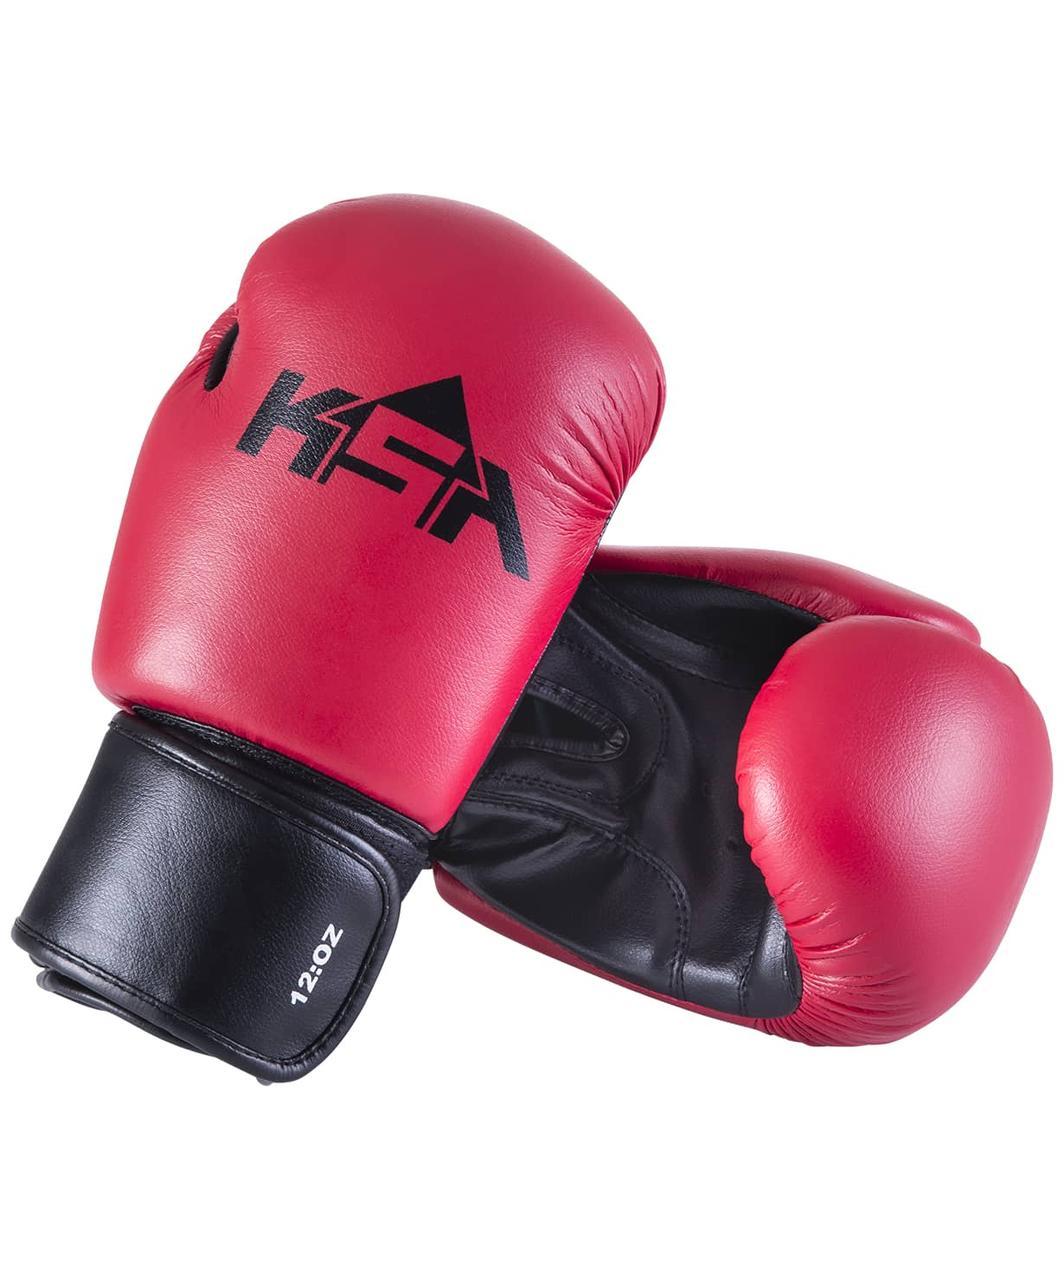 Перчатки боксерские Spider Red, к/з, KSA